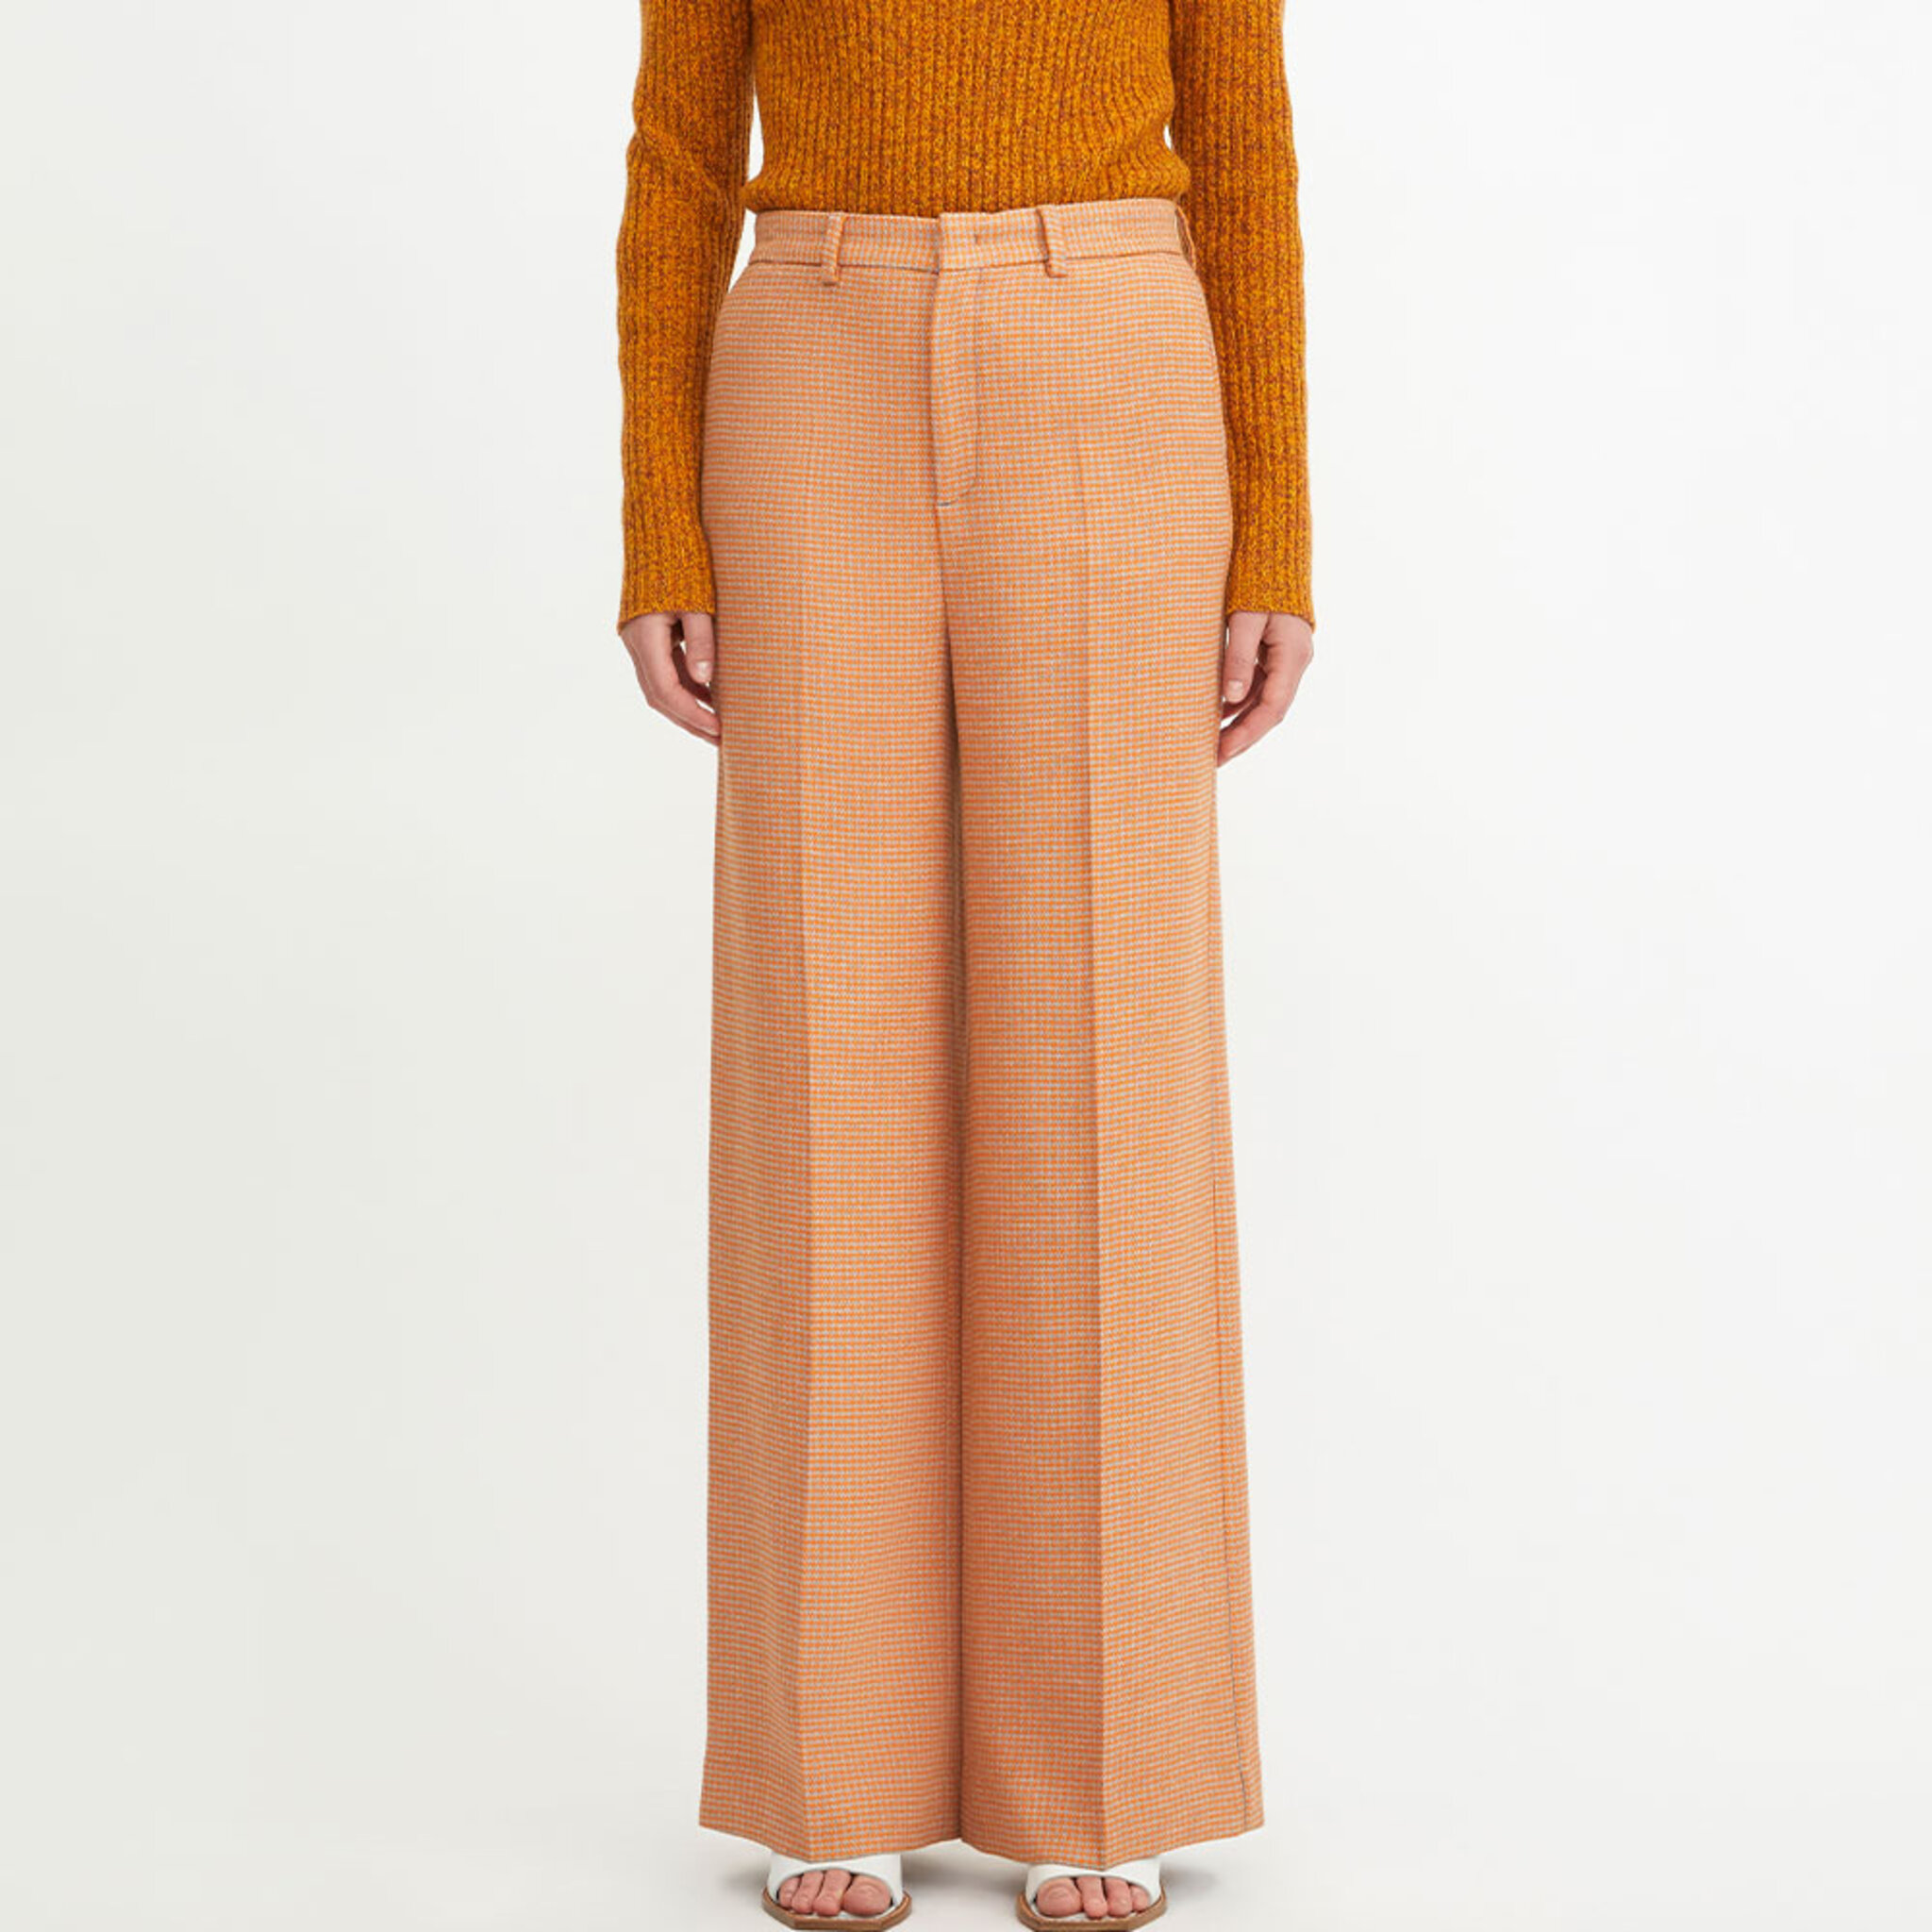 Pants Meche Weave